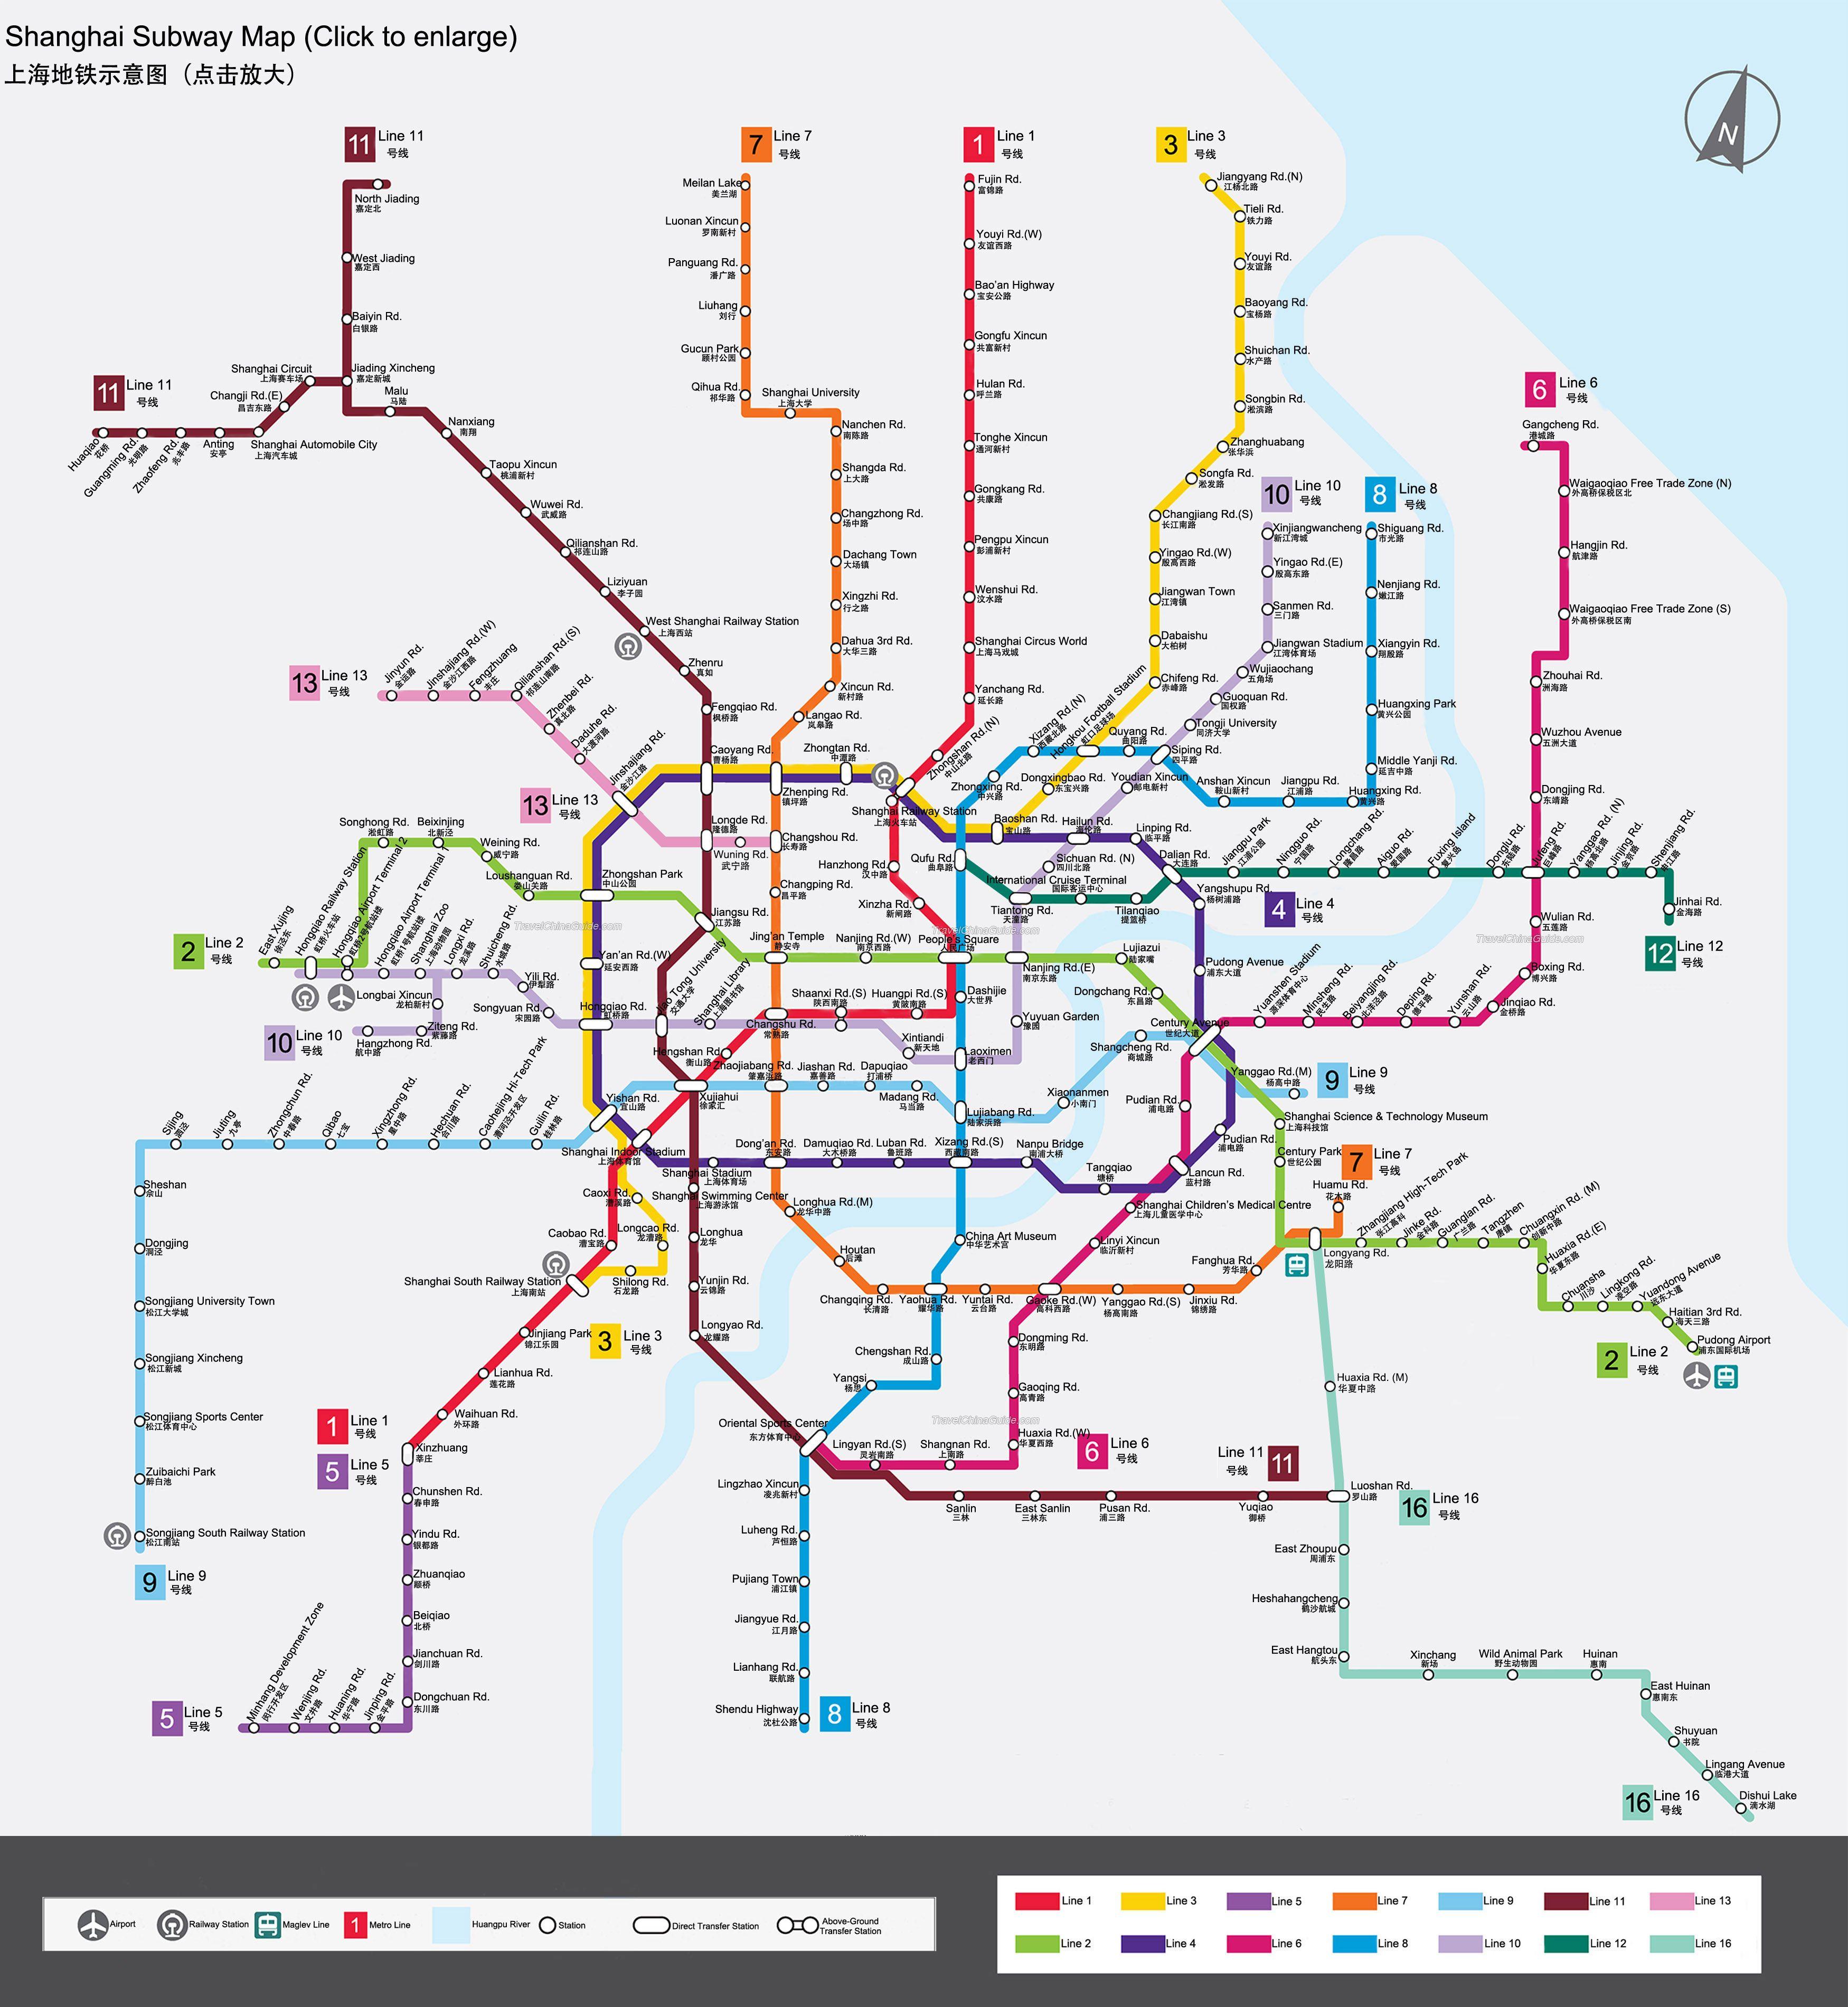 Shanghai Subway Map | Shanghai in 2019 | Subway map, China ... on map of montreal metro, map of hamburg metro, map of prague metro, map of panama city metro, map of metro rail, map of washington metro, map of zhengzhou metro, map of london metro, map of dubai metro, map of moscow metro, map of barcelona metro, map of houston metro, map of suzhou metro, map of chicago metro, map of rome metro, map of nanjing metro, map of dublin metro, map of shenzhen metro, map of copenhagen metro, map of brussels metro,